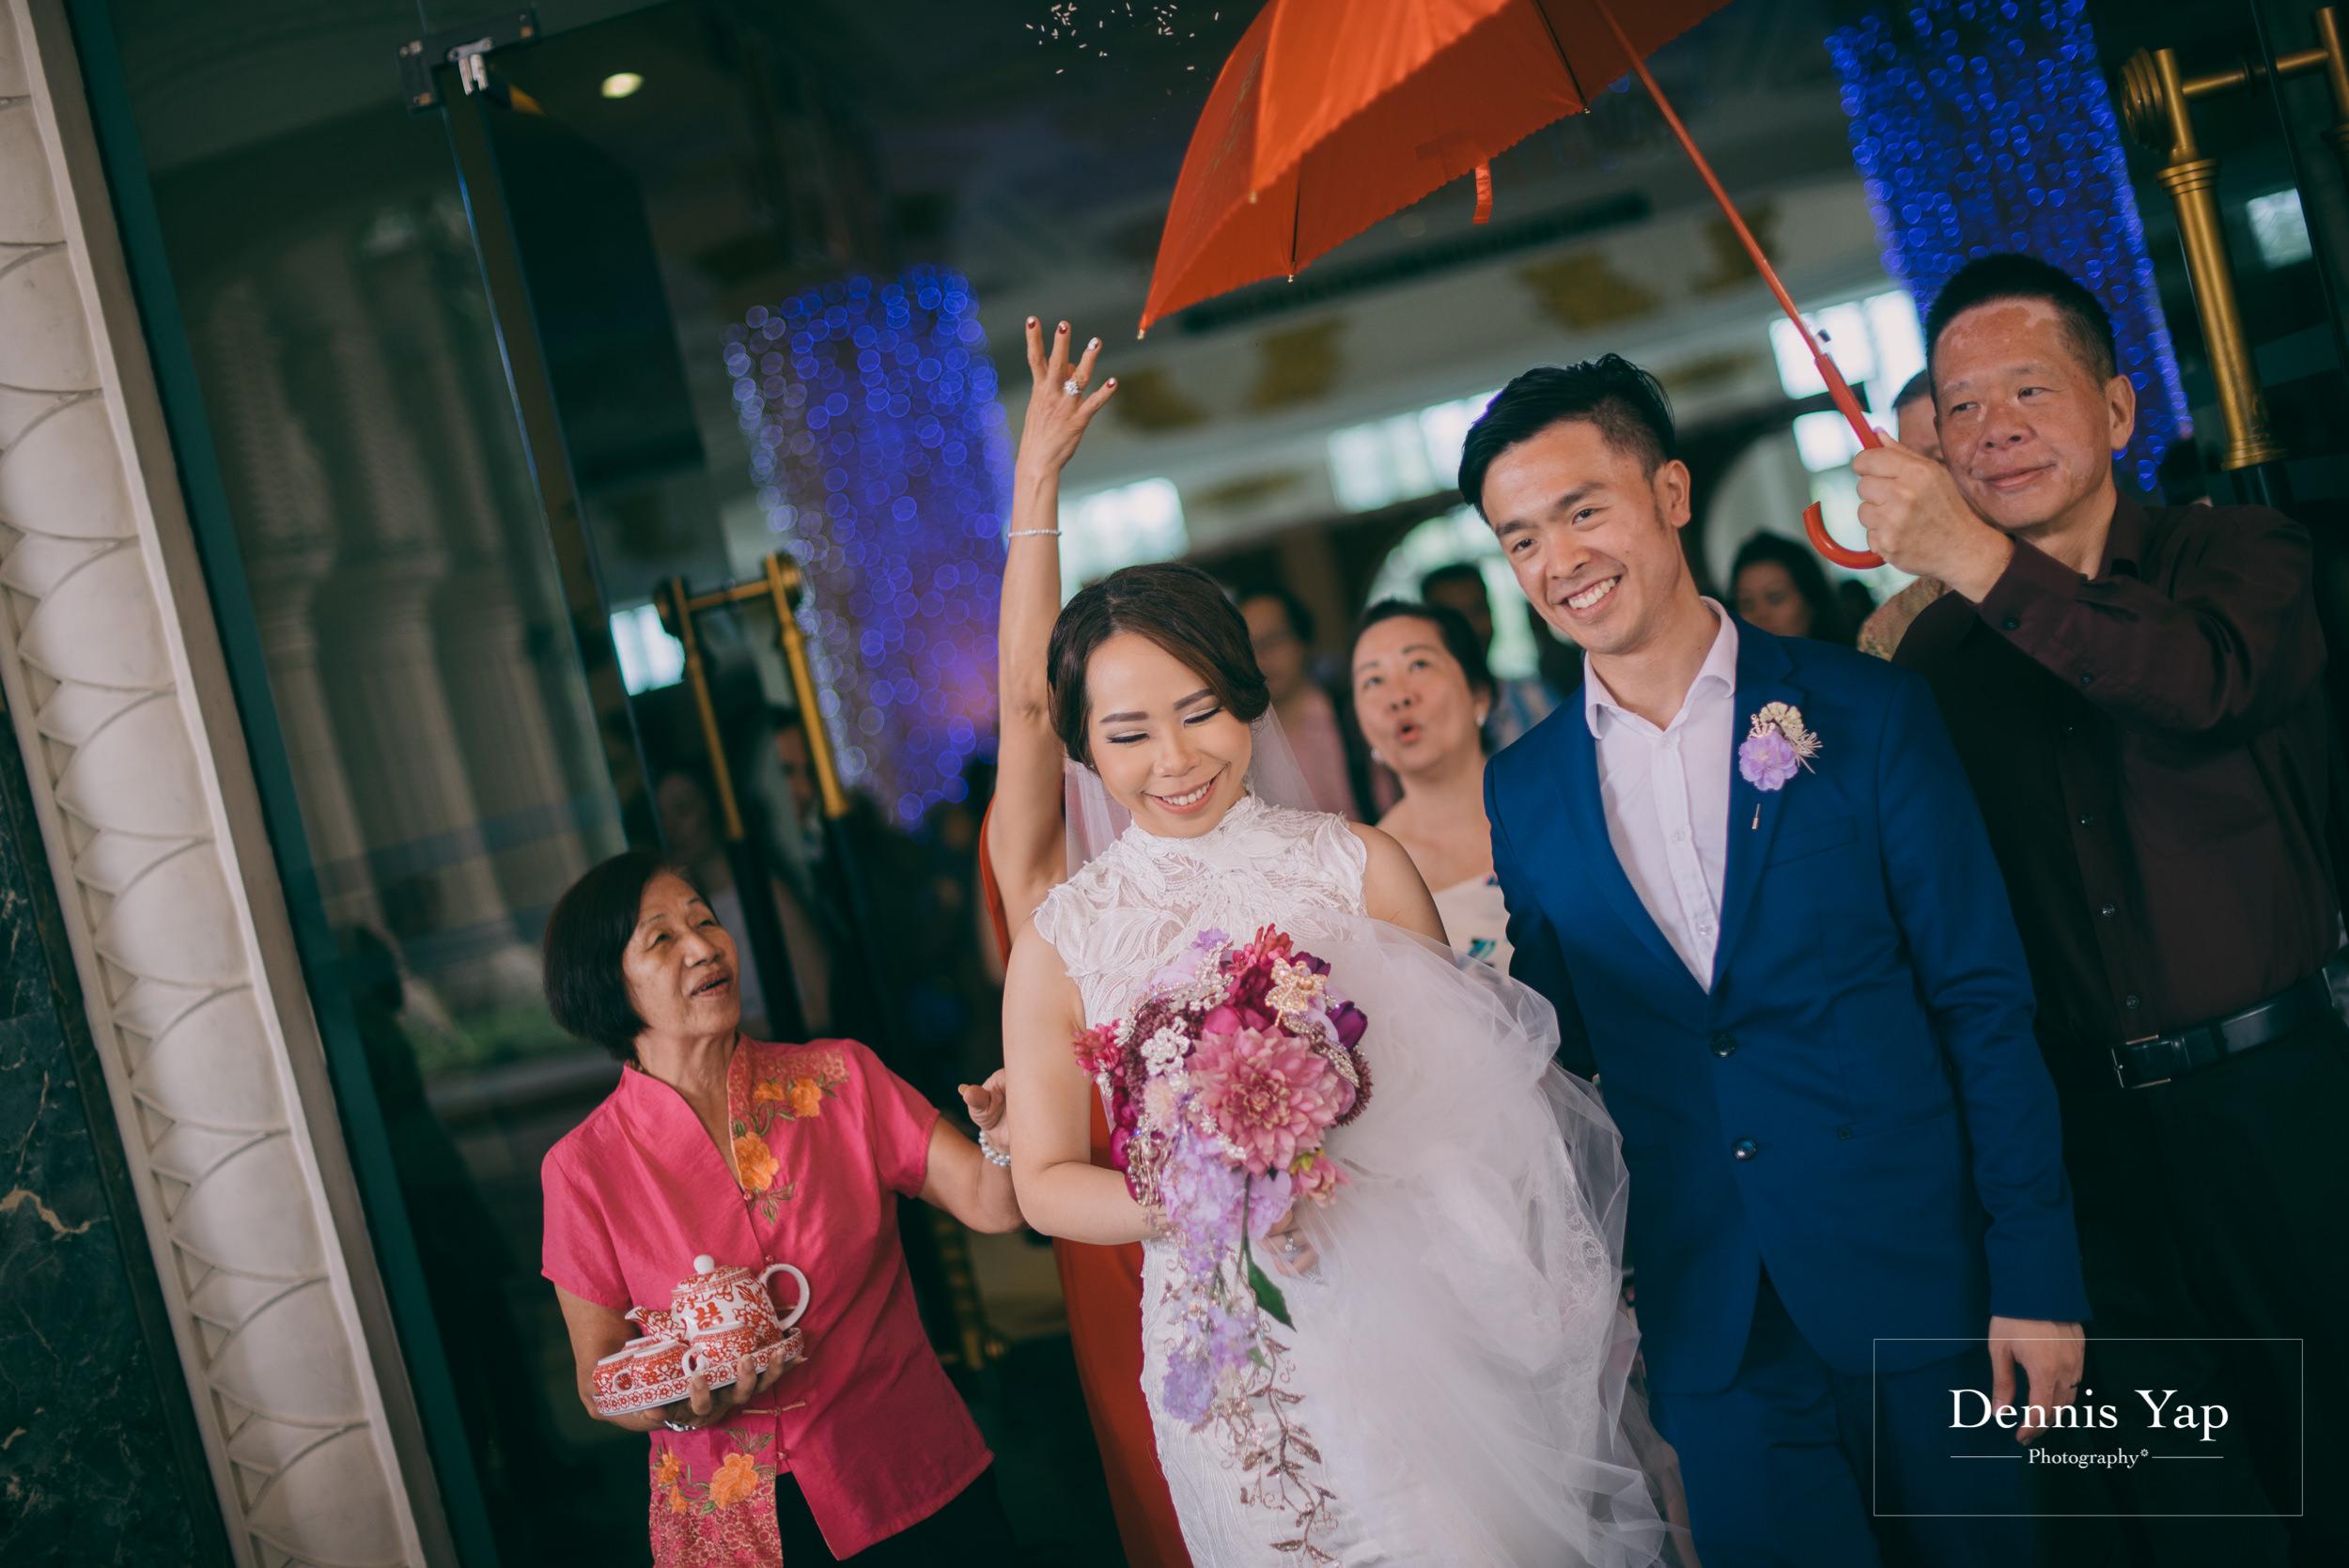 keat mandy wedding day marriot putrajaya dennis yap malaysia wedding photographer-17.jpg